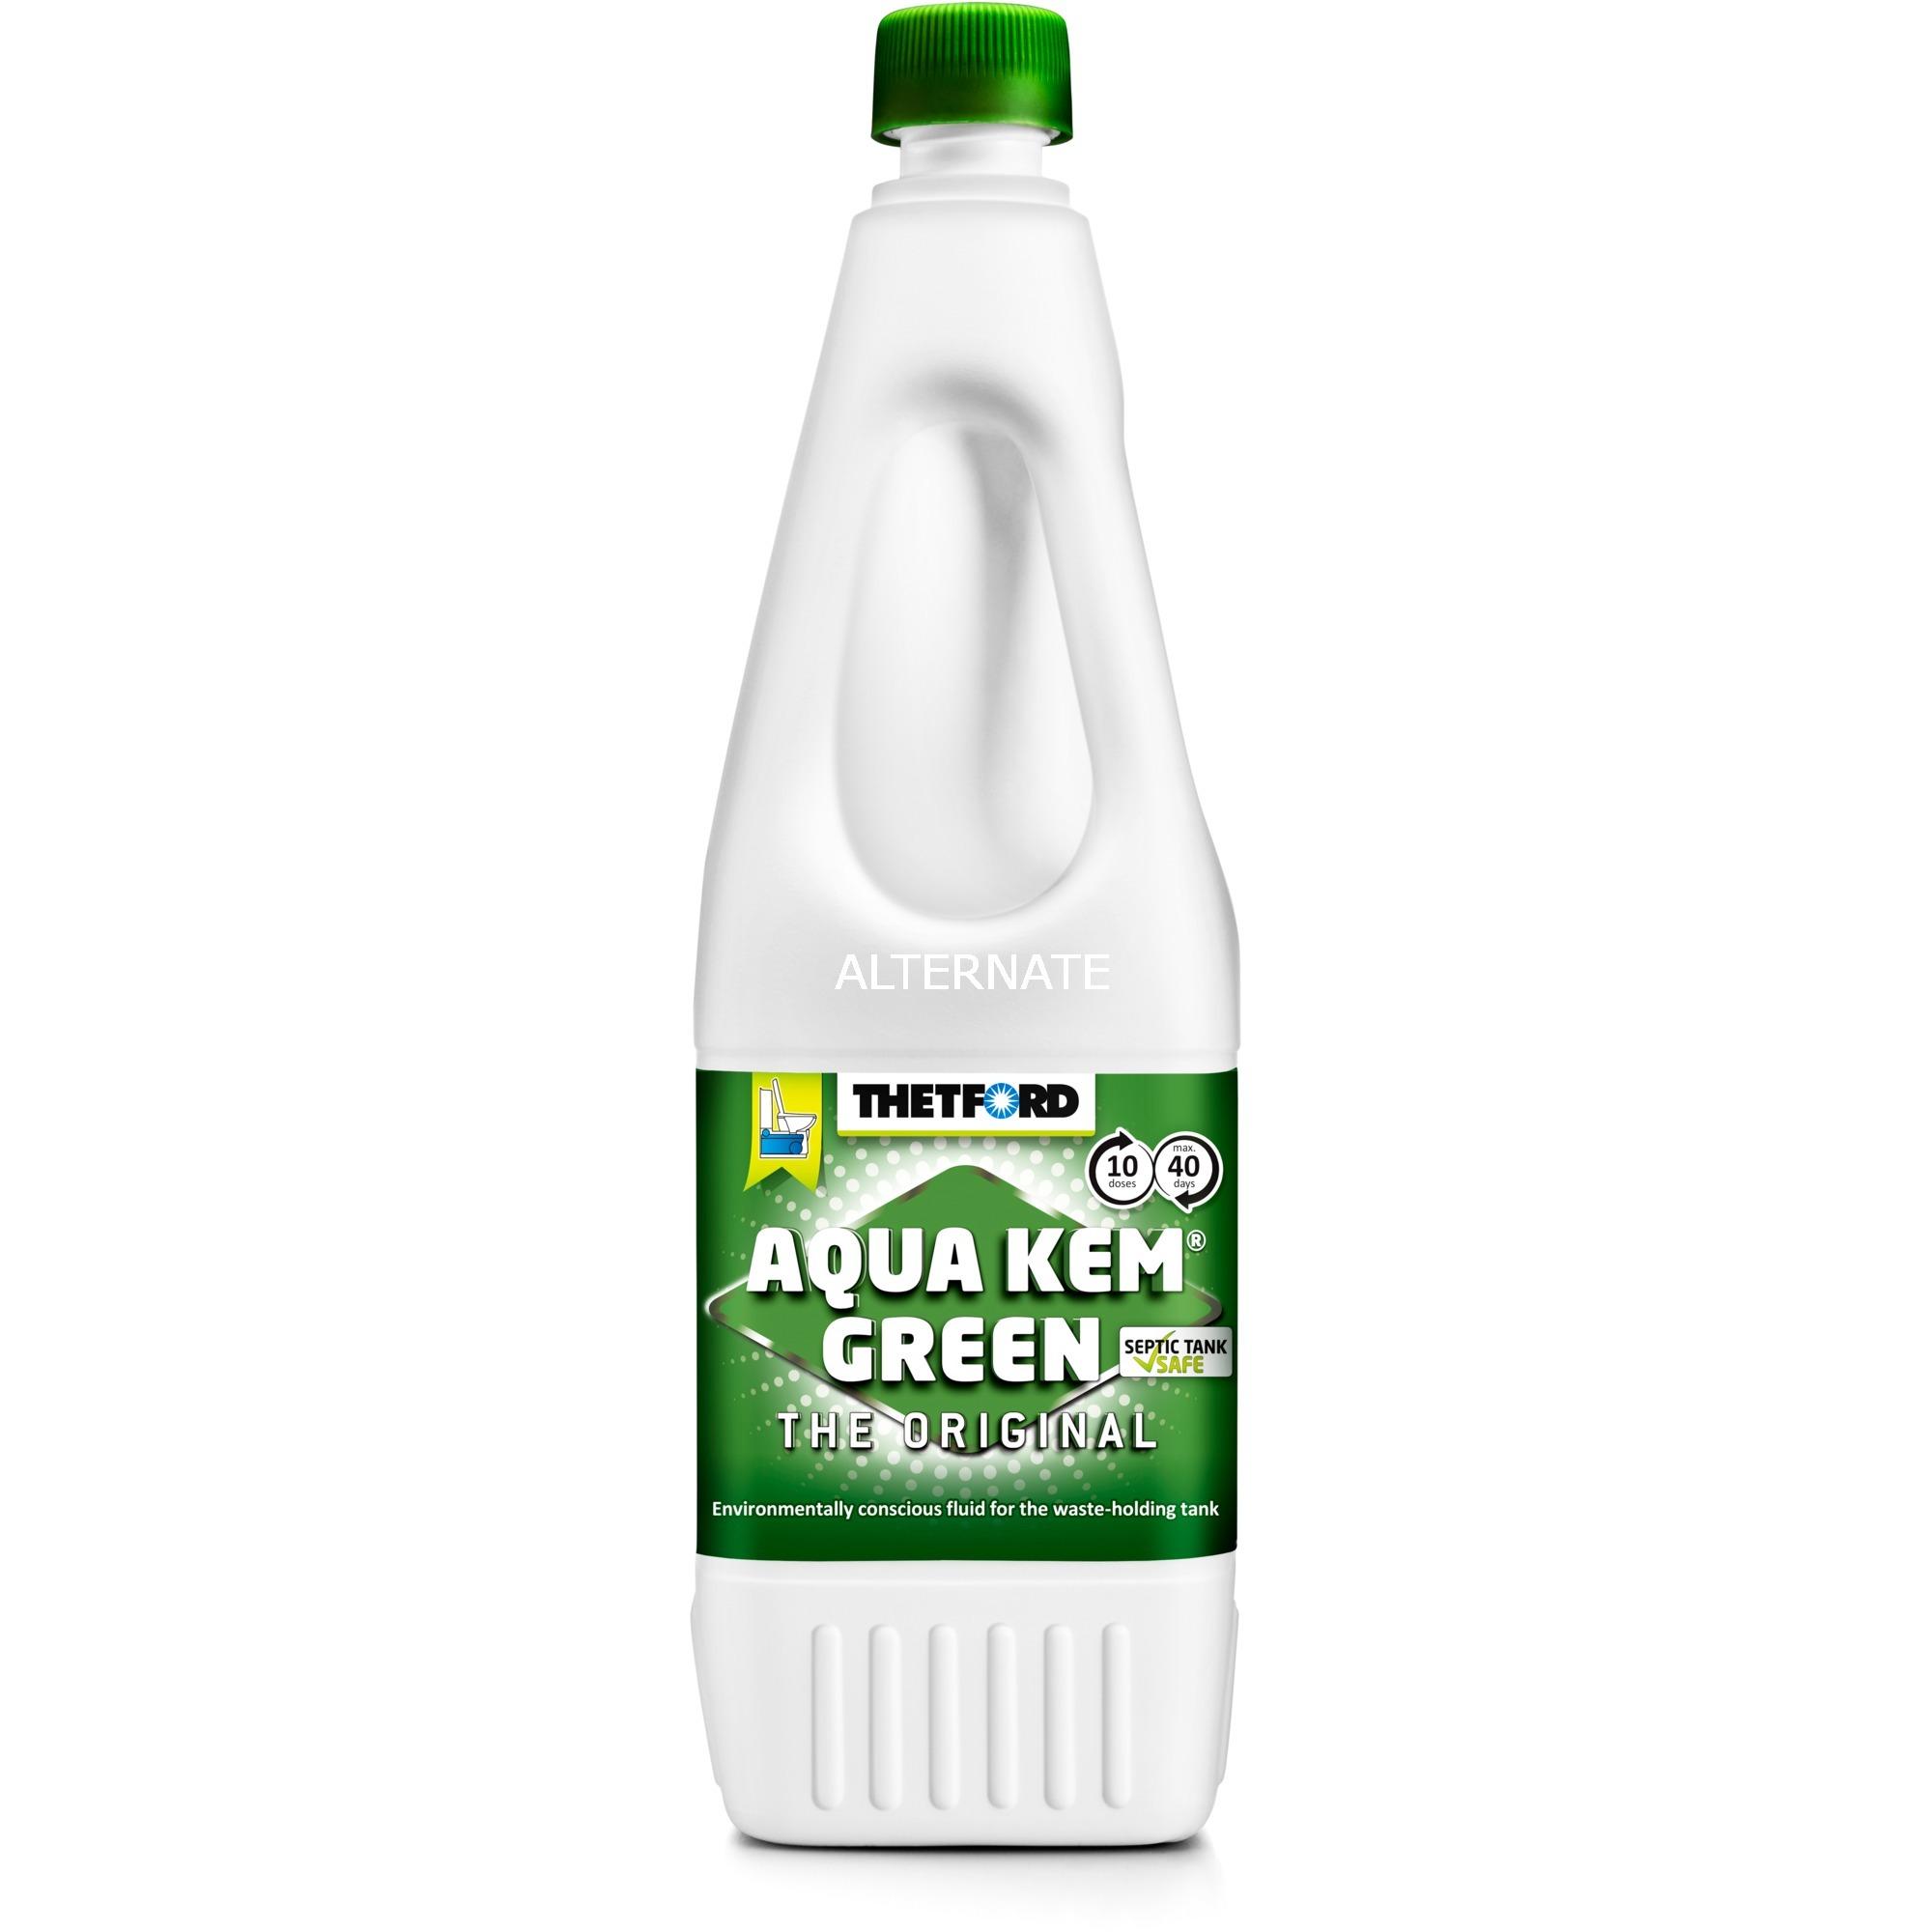 Aqua Kem Green Aditivo químico para inodoro 1,5 L, Aditivo sanitario